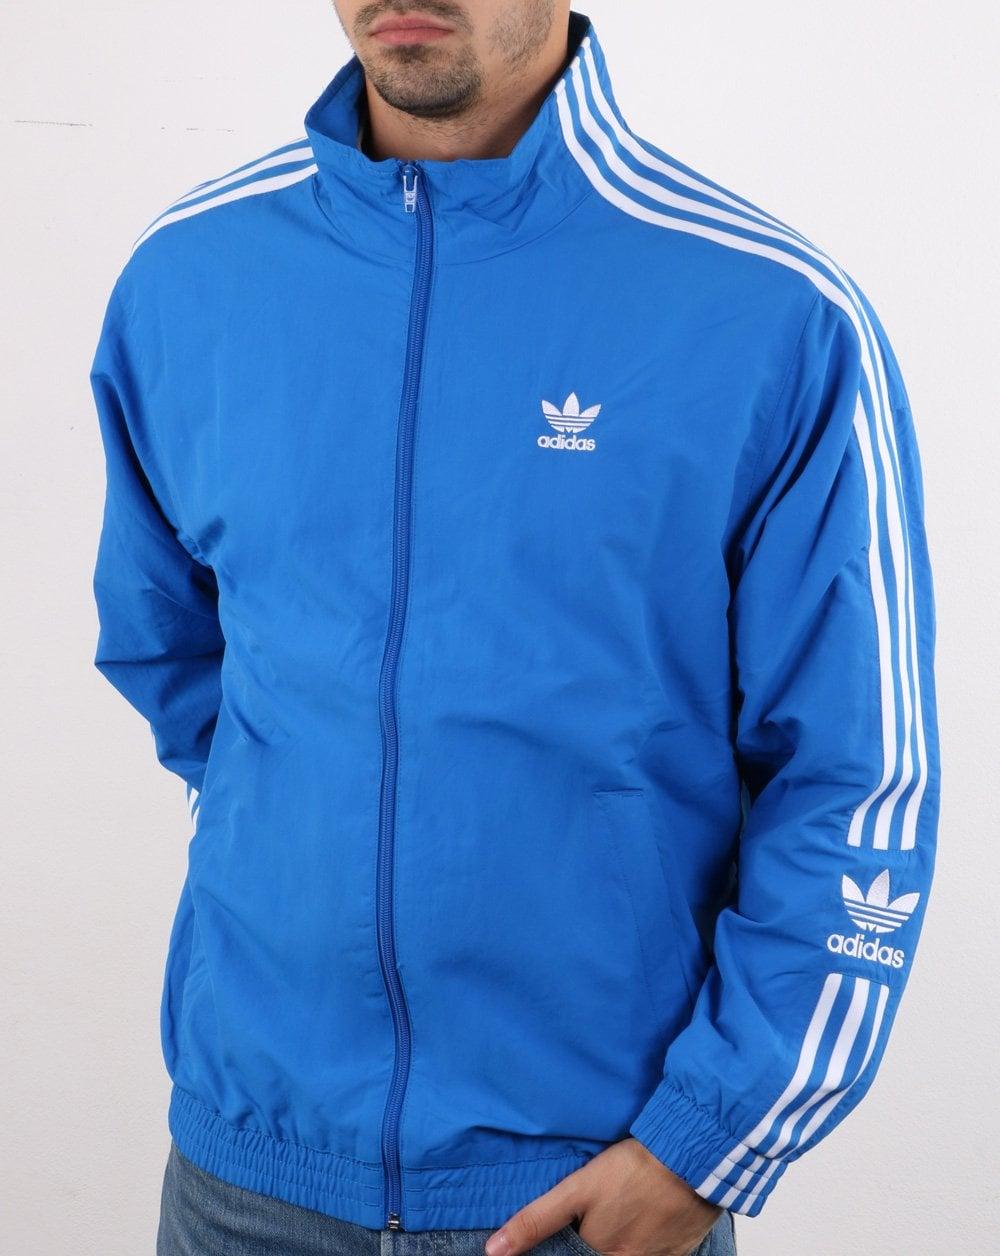 Diffidenza lotto Pilastro  Adidas Originals Jacket Bluebird Blue - adidas At 80s Casual Classics